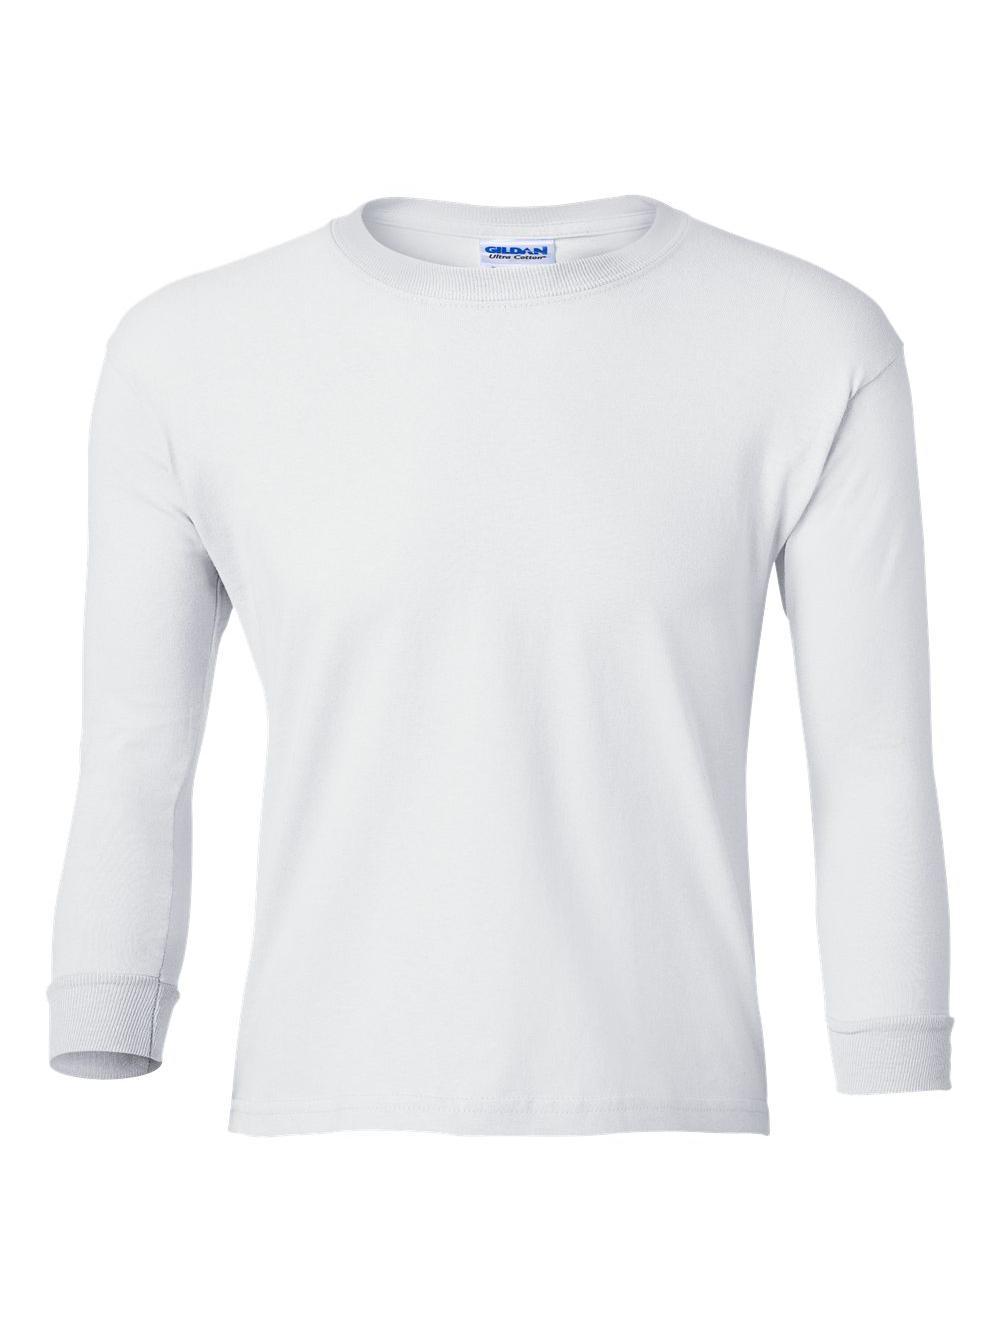 Gildan-Ultra-Cotton-Youth-Long-Sleeve-T-Shirt-2400B thumbnail 45